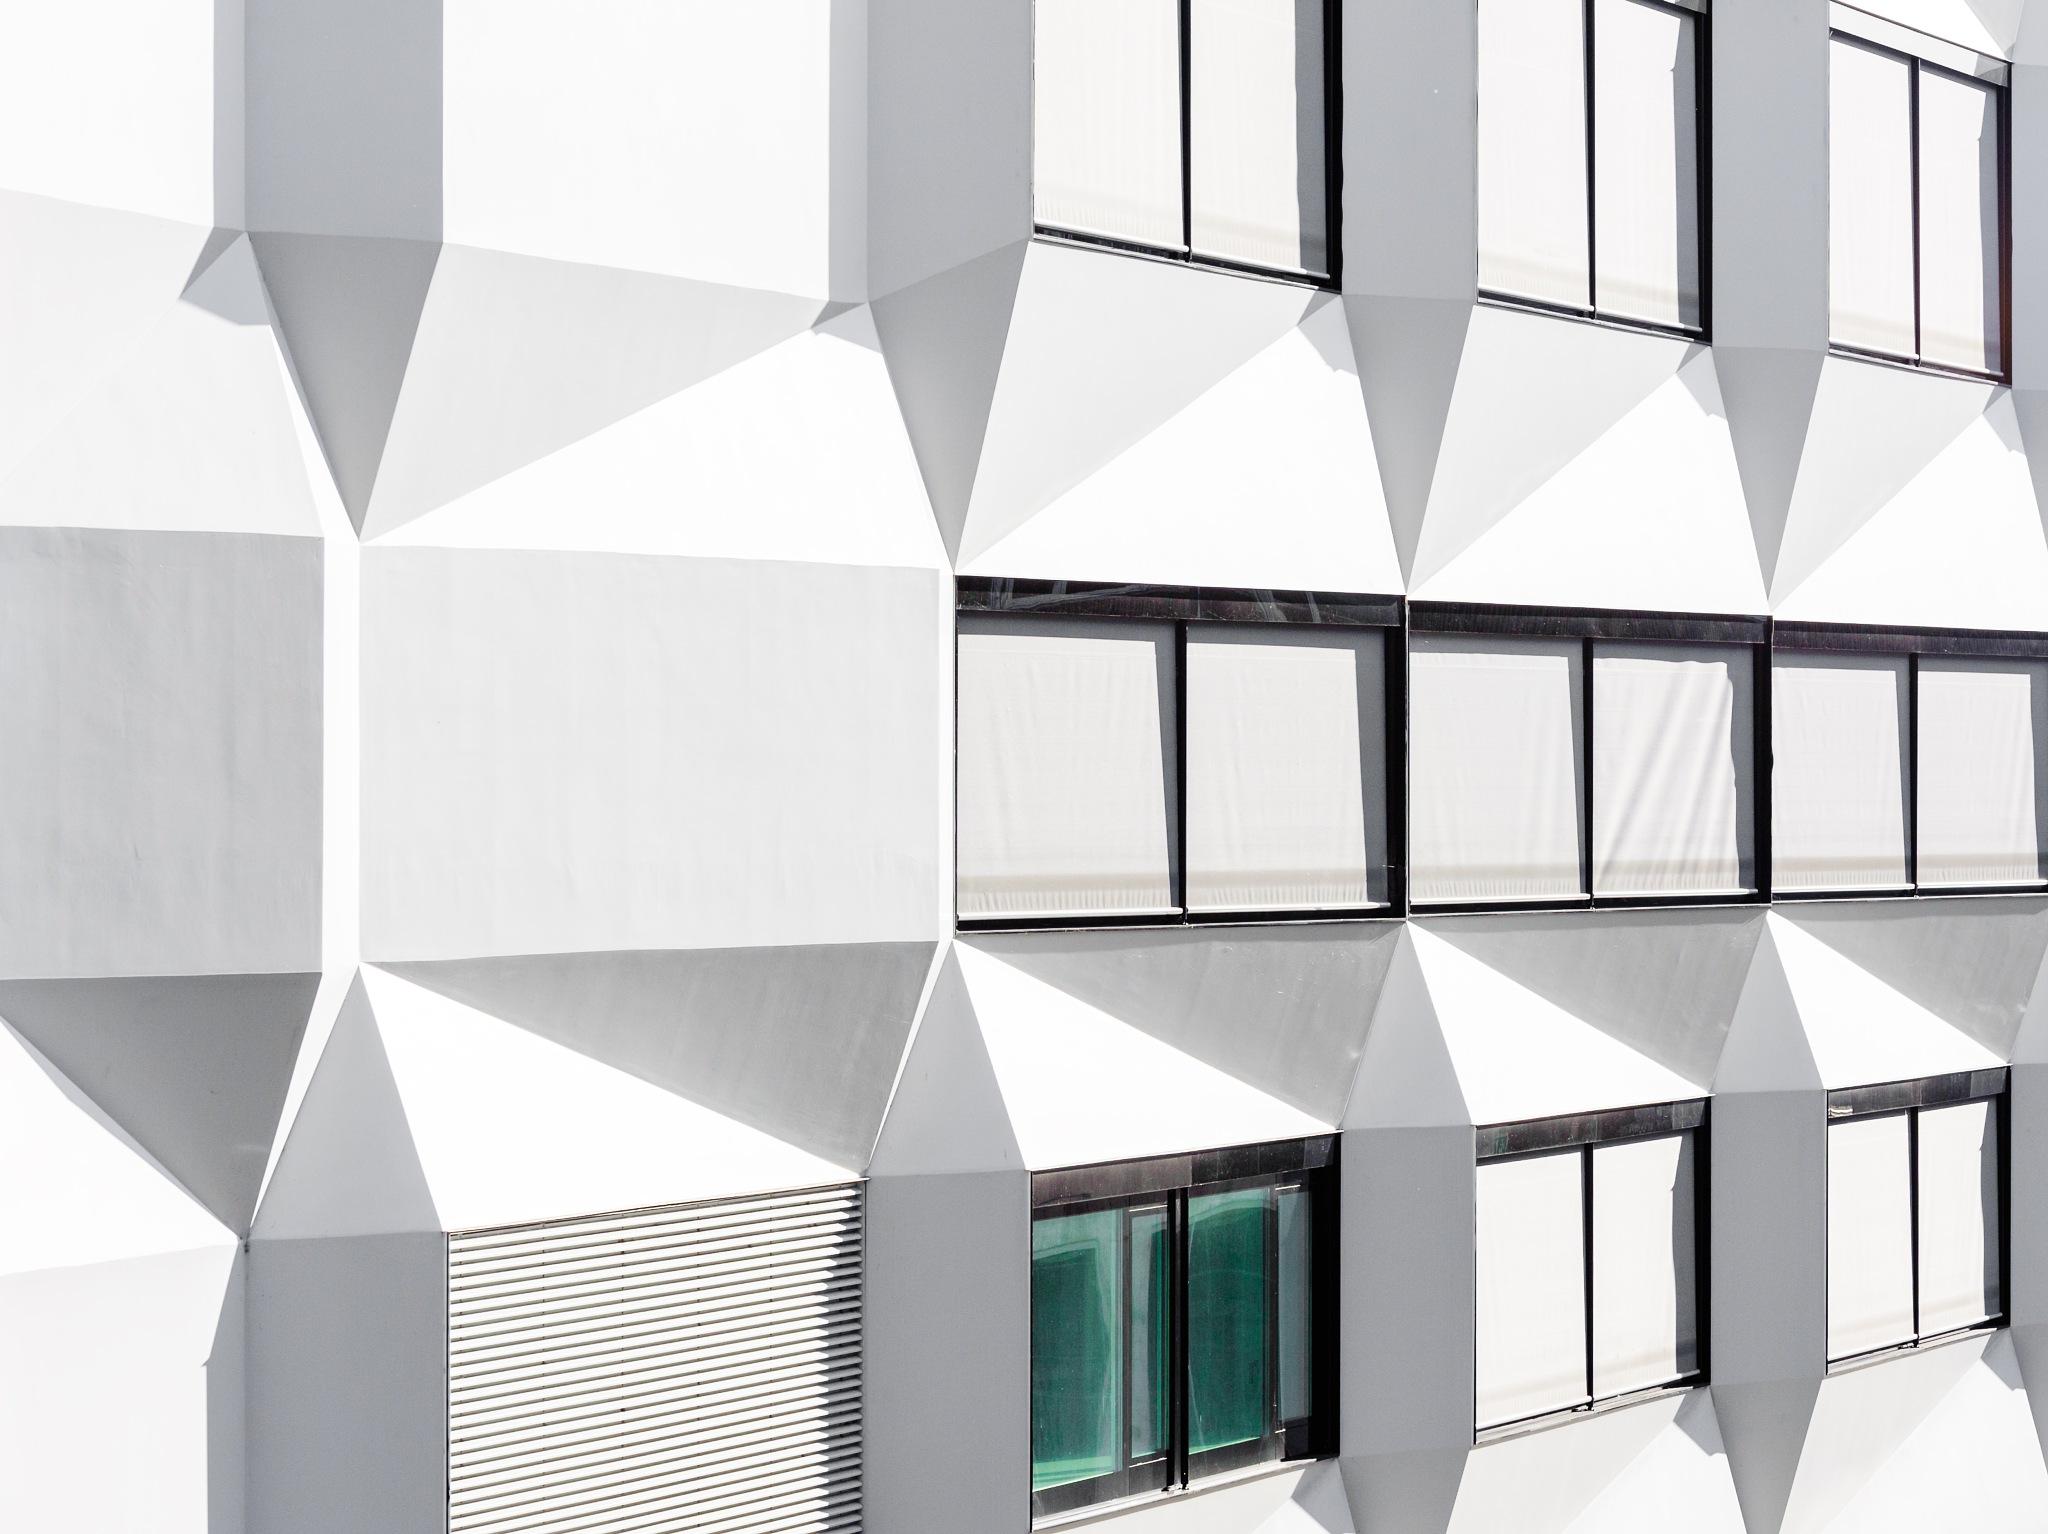 PH Luzern by Roland Bucheli